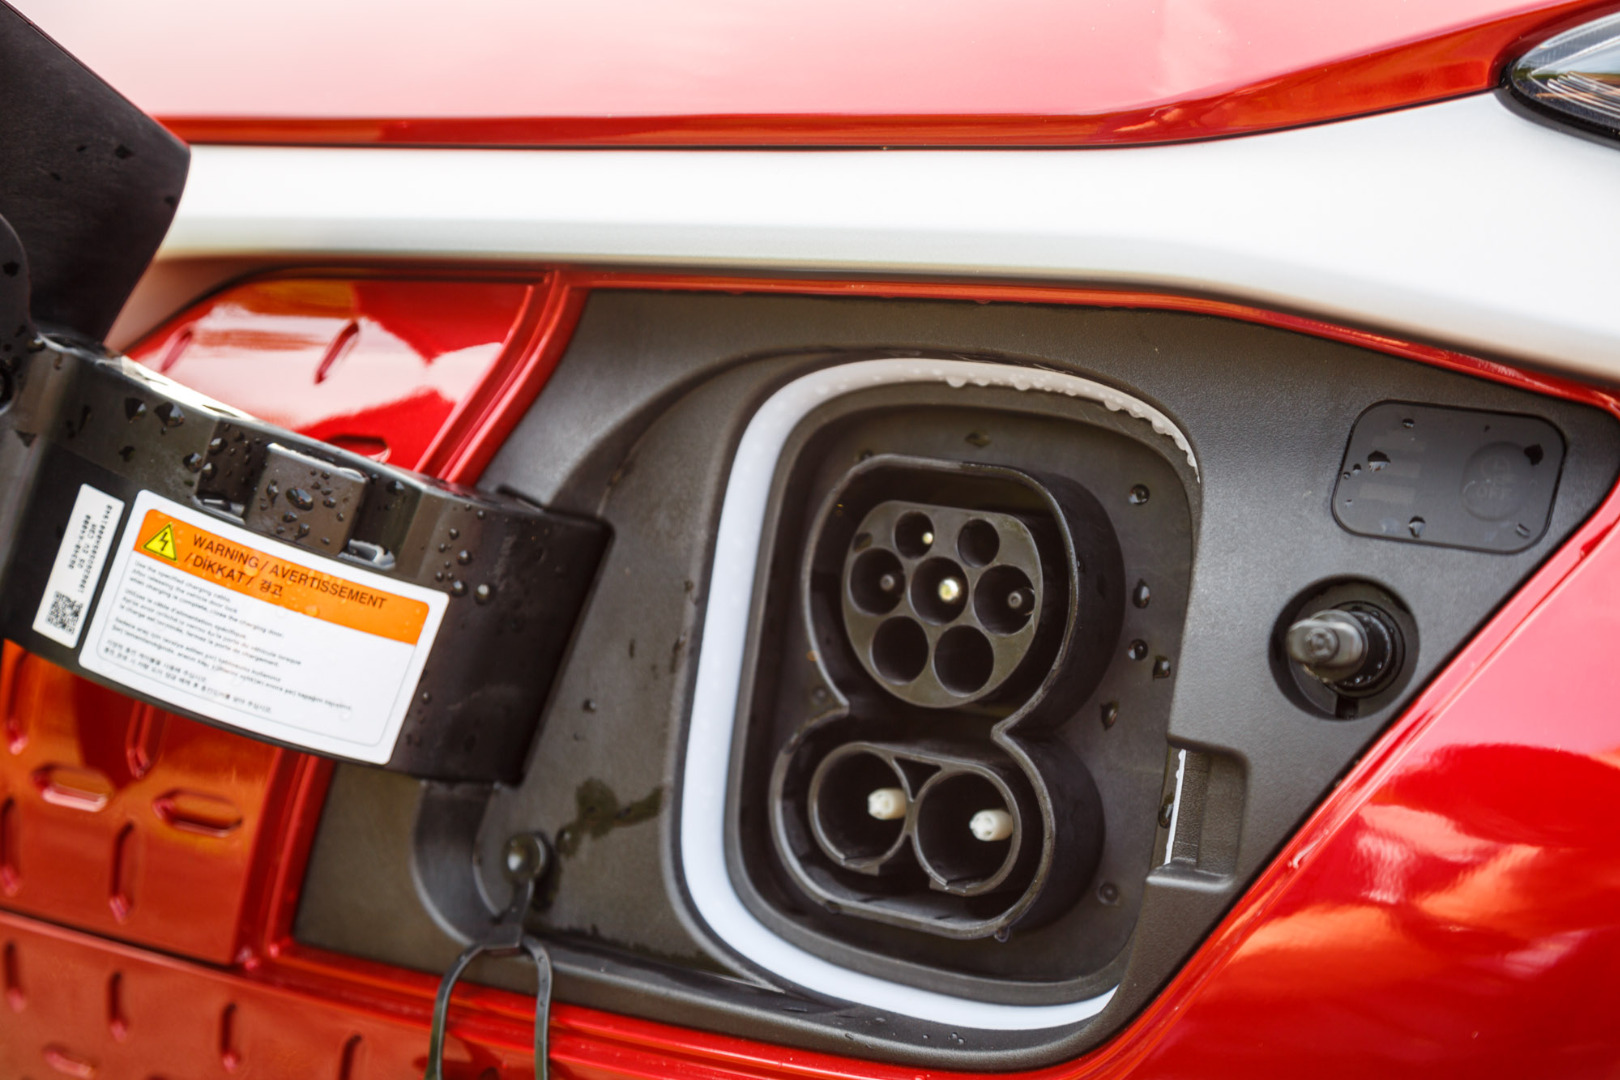 Hyundai-Kona-Electric-Premium-SE-64-kWh-27.jpg